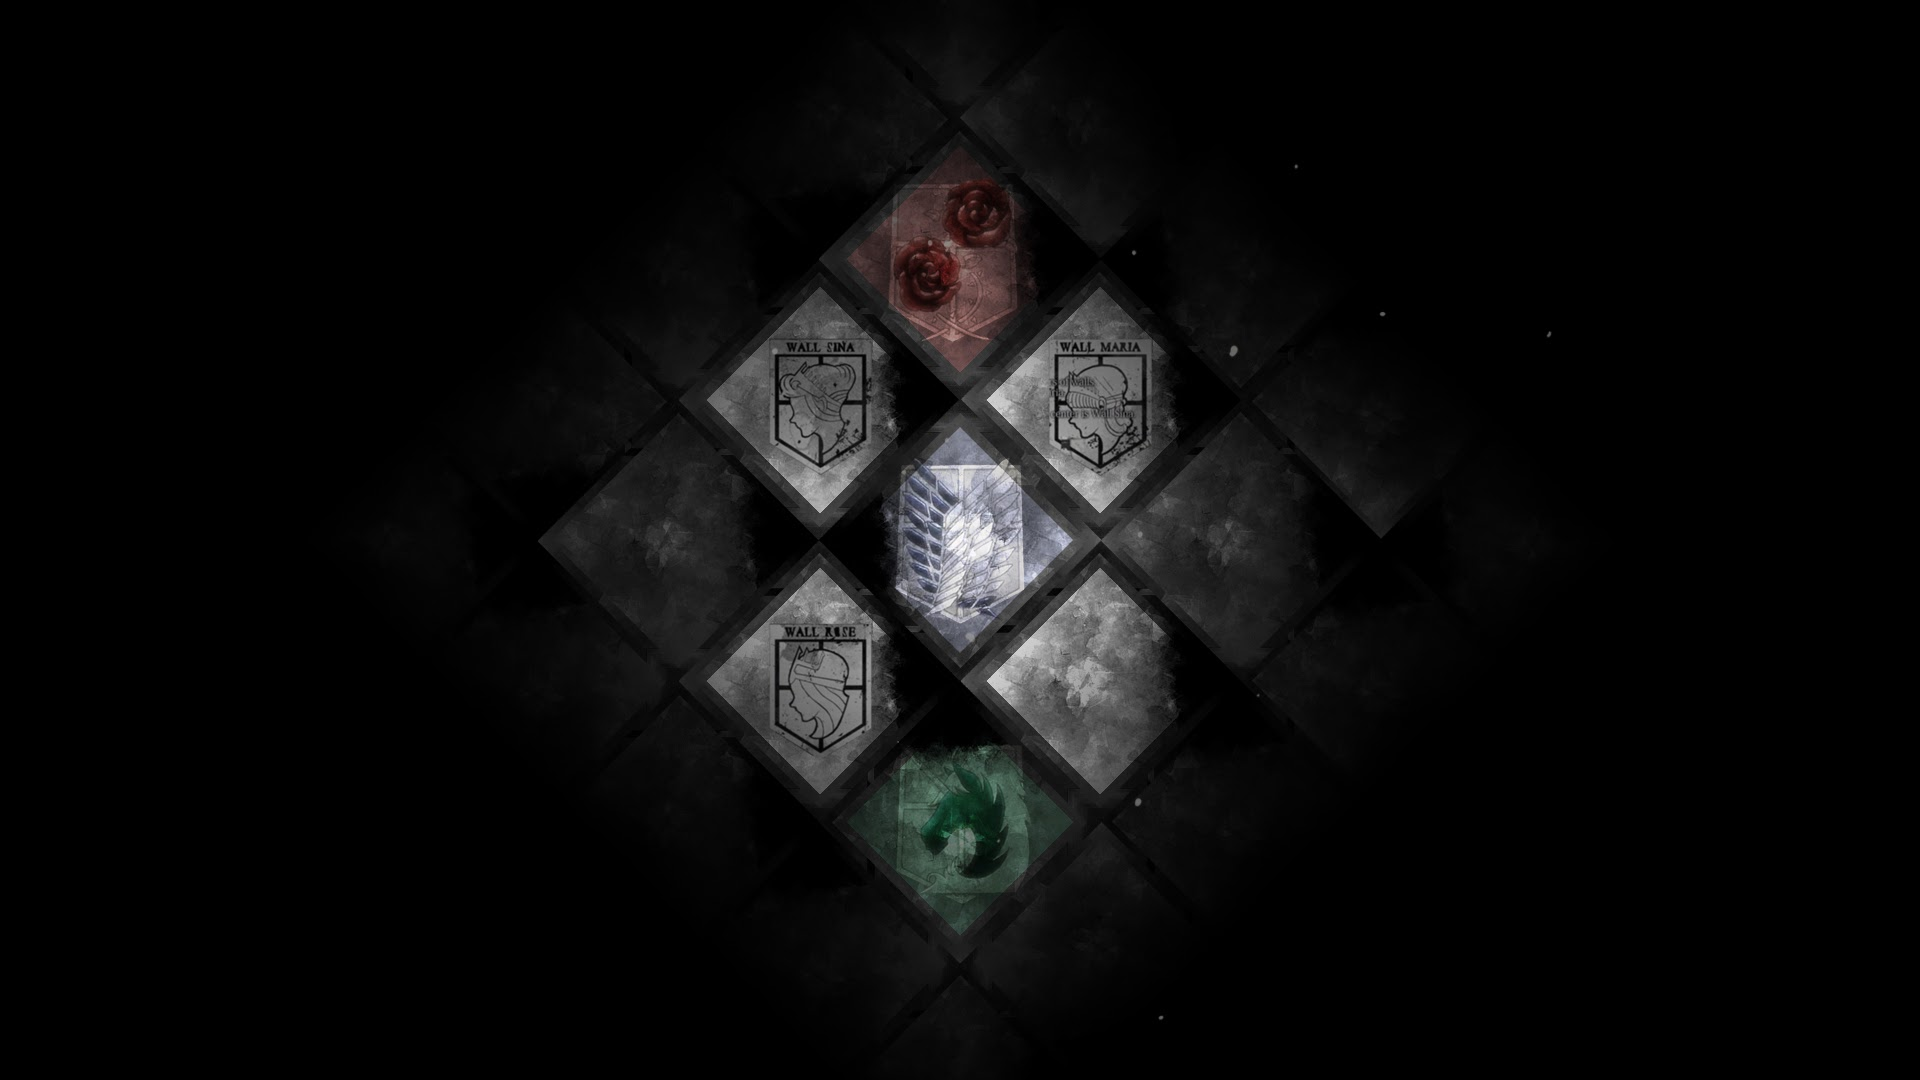 Attack on titan: emblem HD Wallpaper   Background Image ...   1920 x 1080 jpeg 113kB